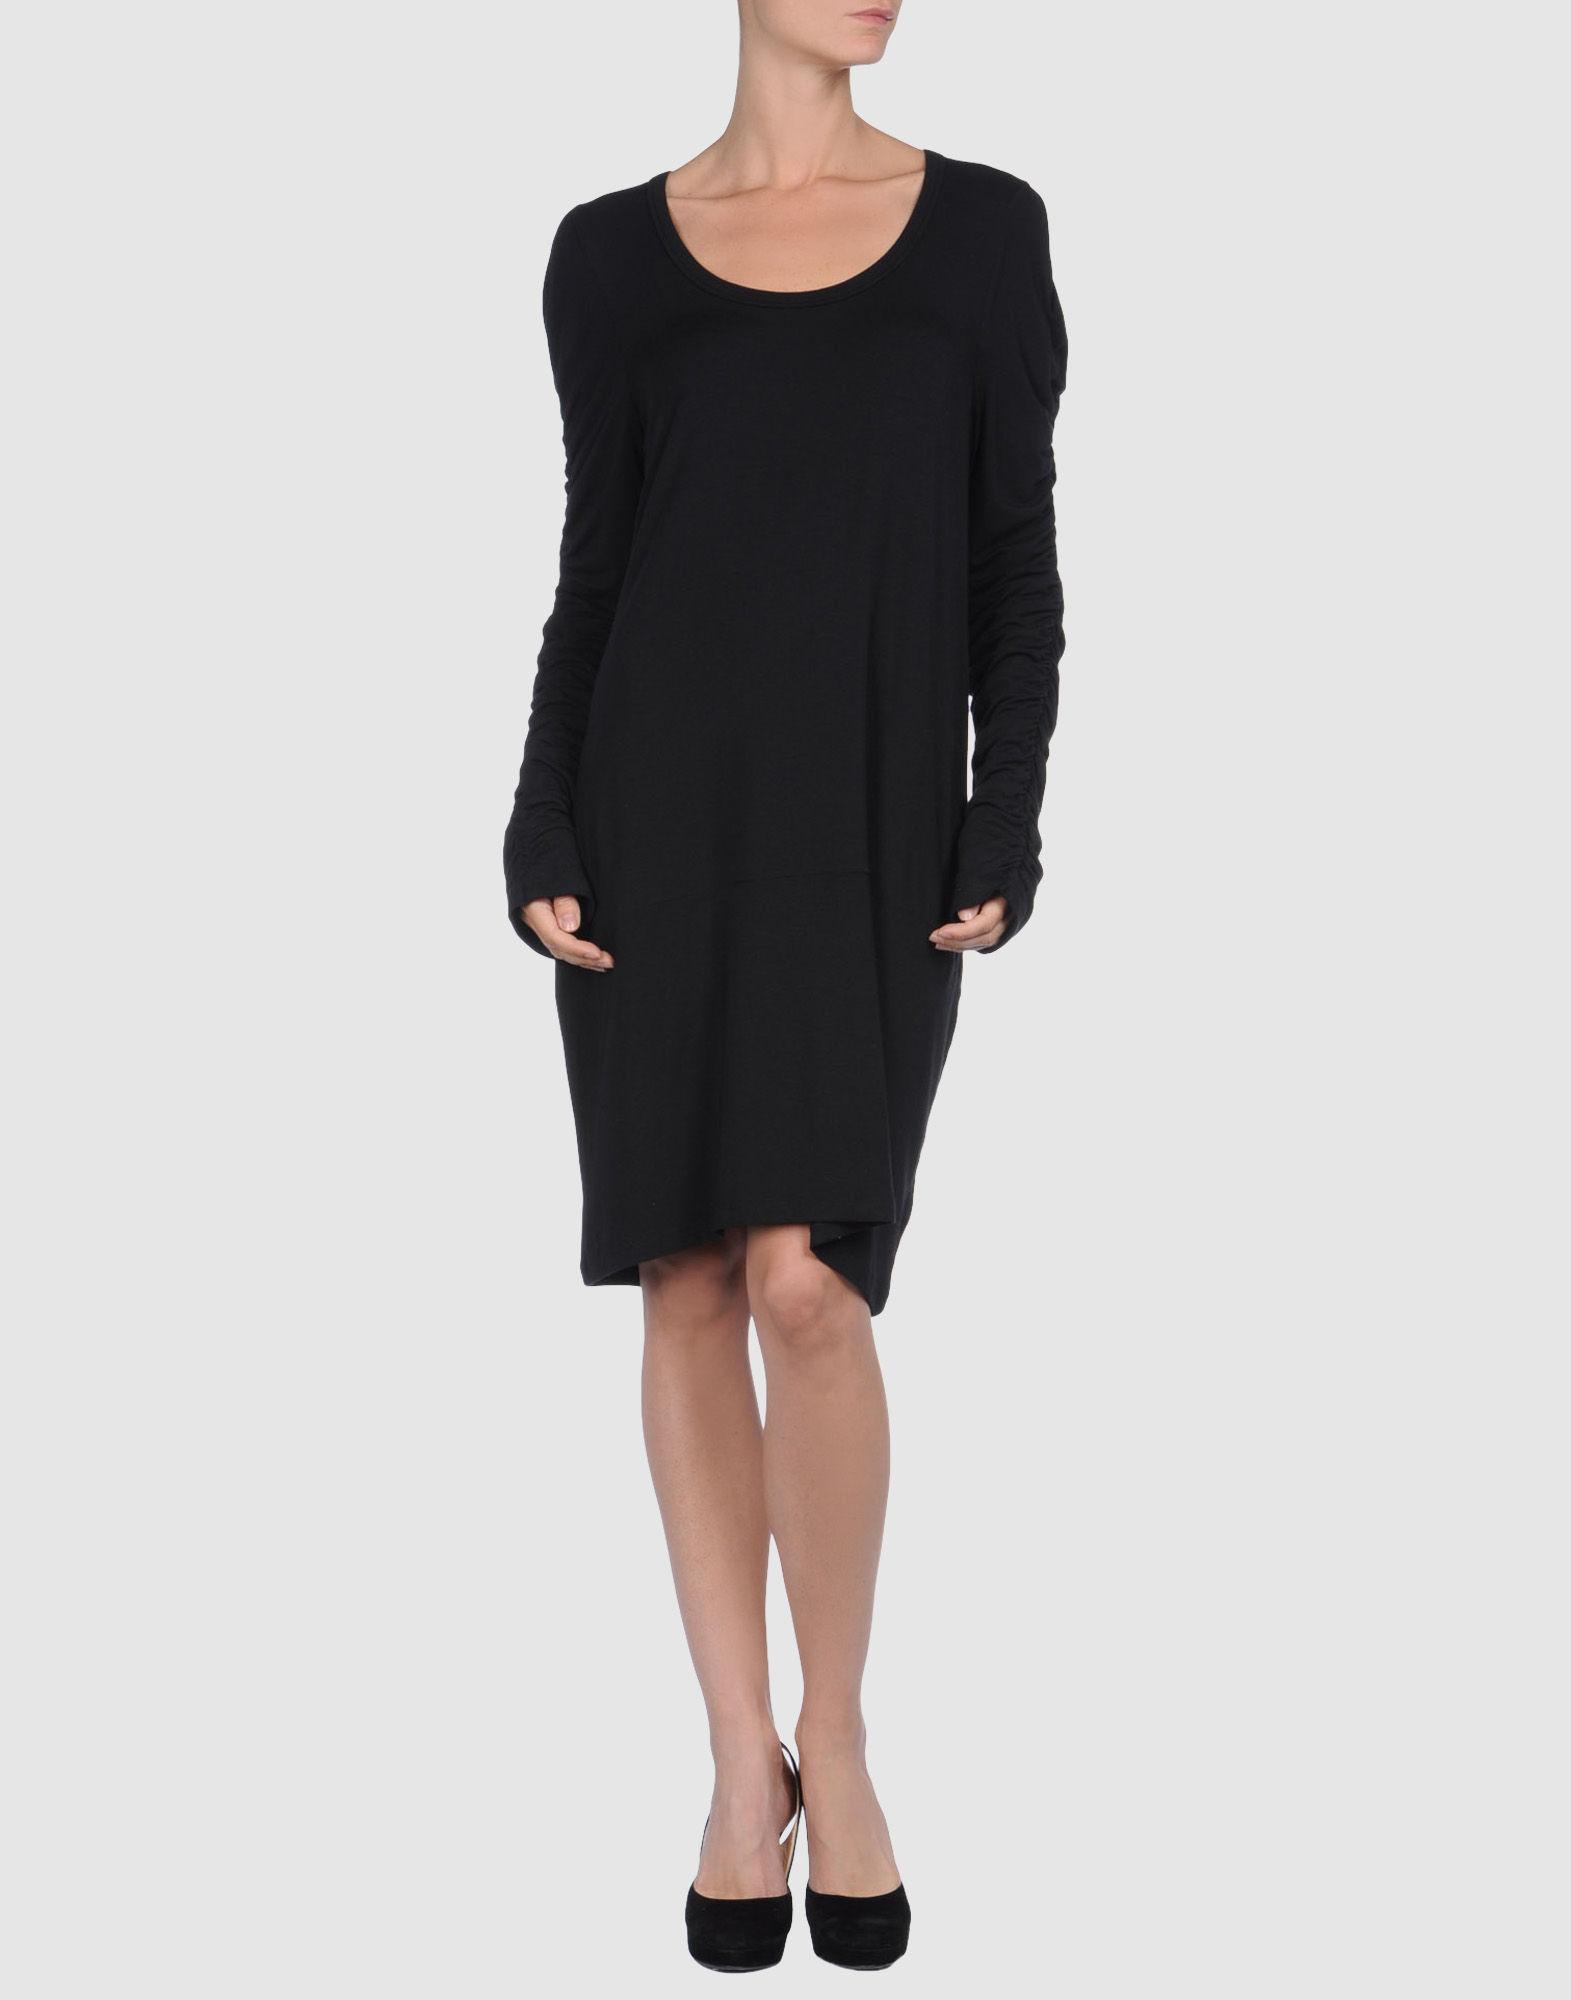 Fashion Designer Betty Jackson